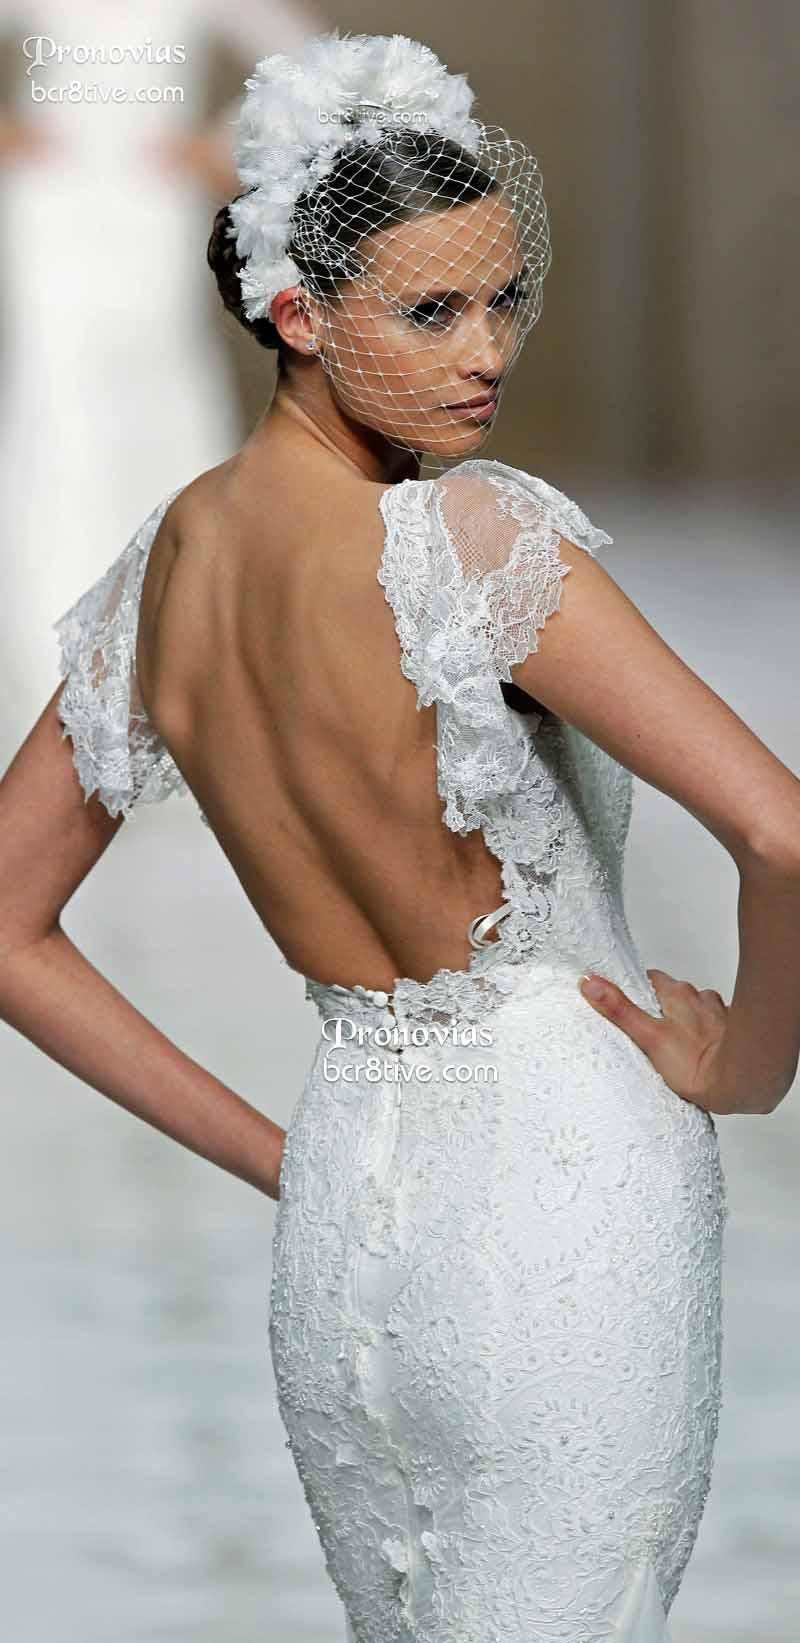 Designer Wedding Gowns on Be Creative